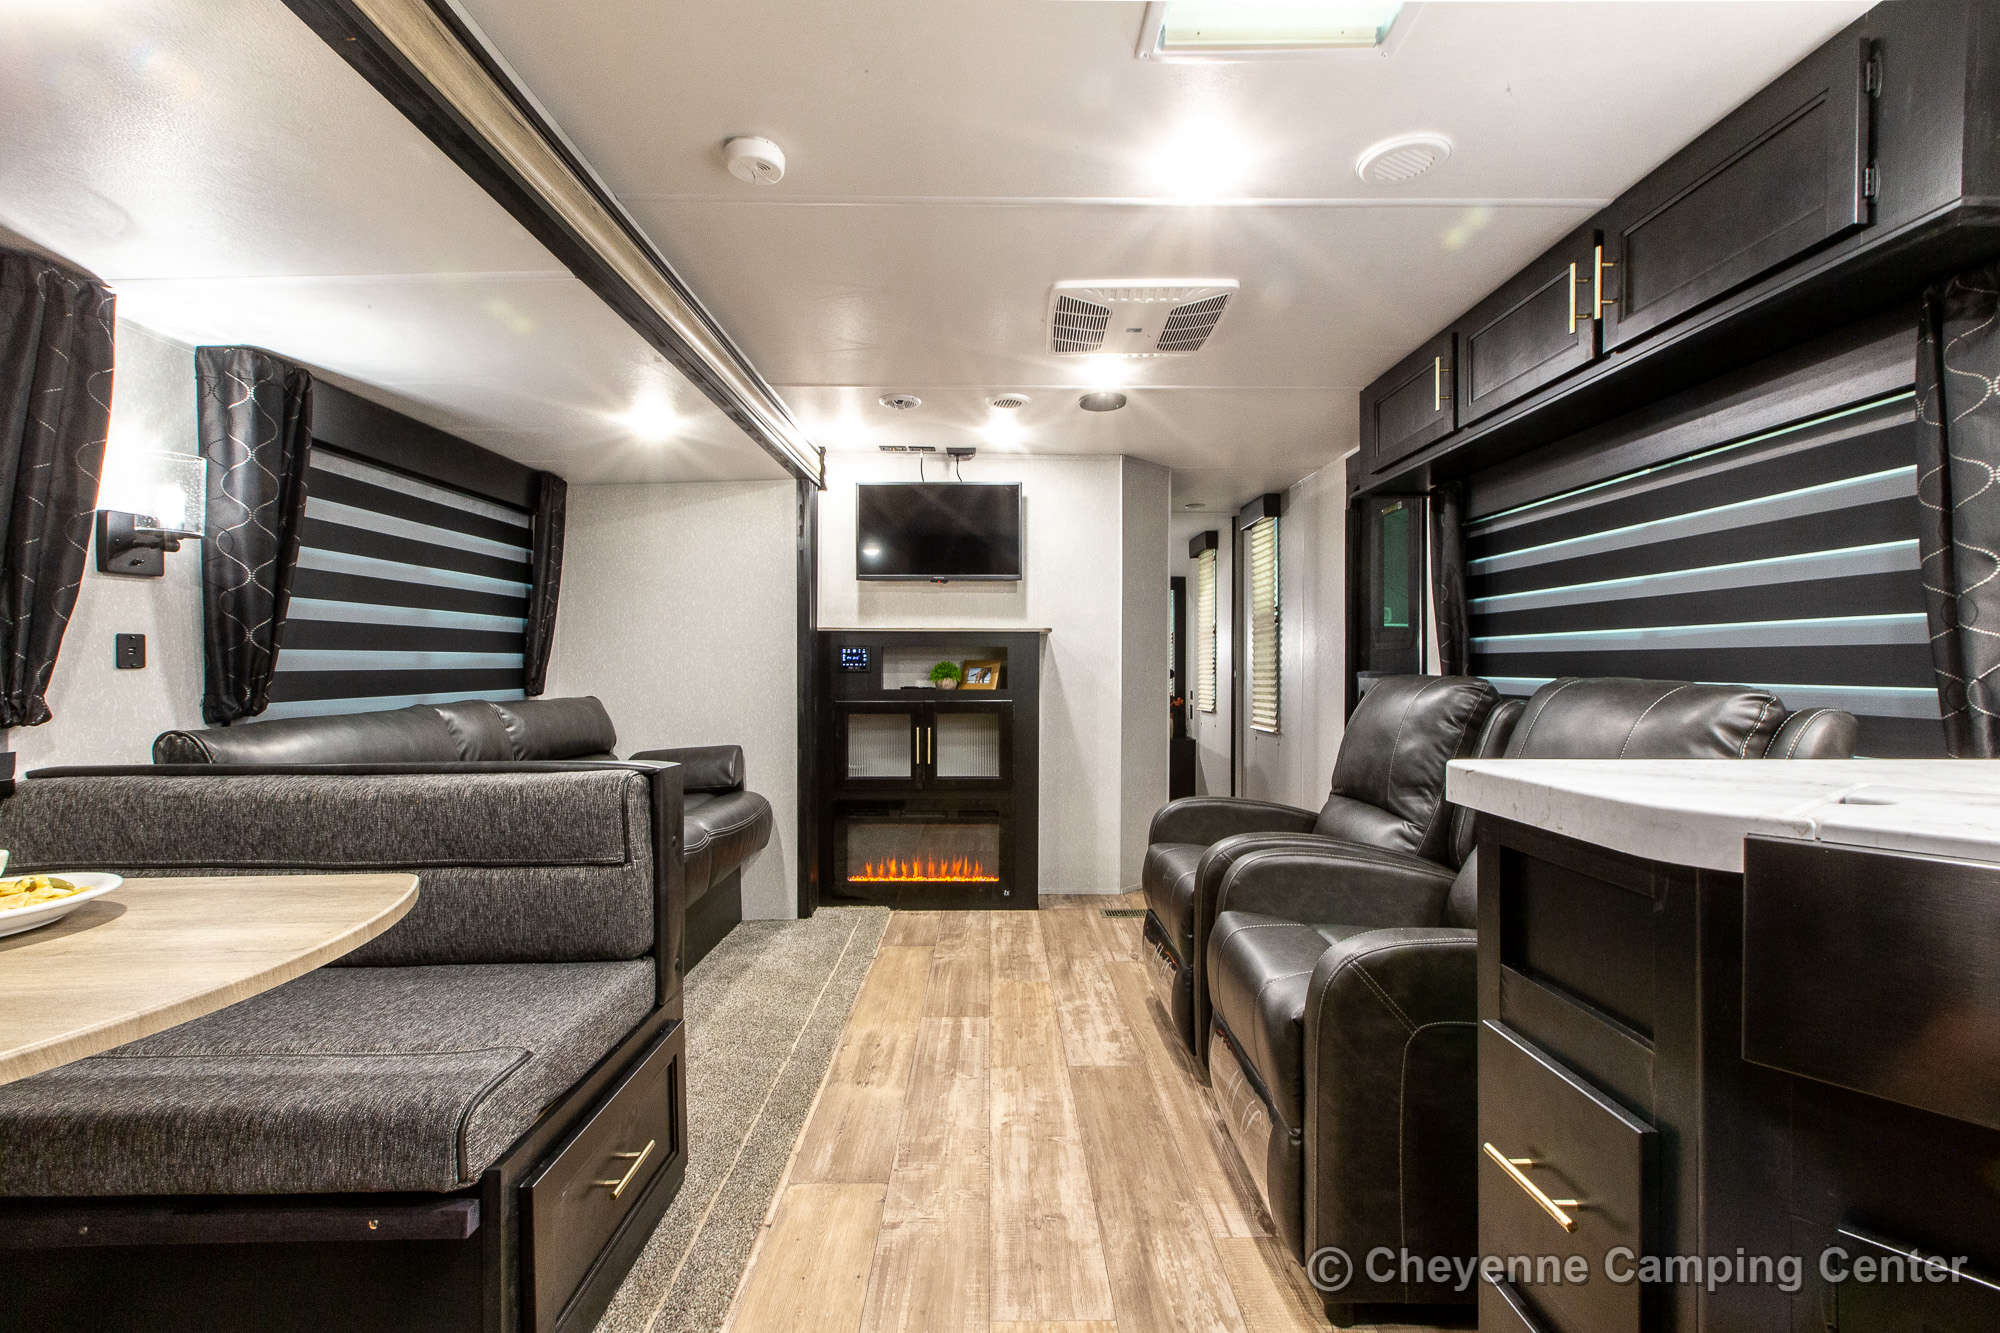 2022 Forest River Cherokee 274RK Travel Trailer Interior Image